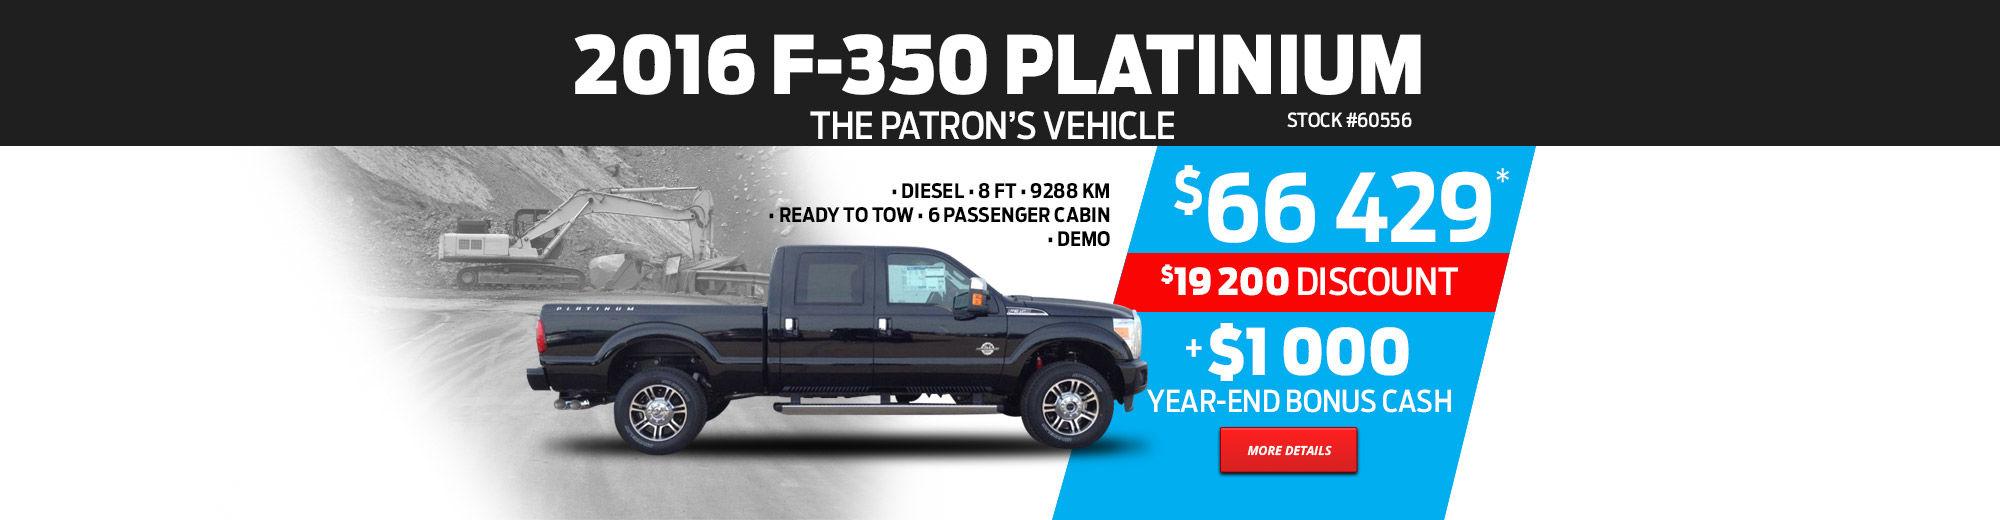 2016 Ford F-350 Platinum 6 passenger cabin